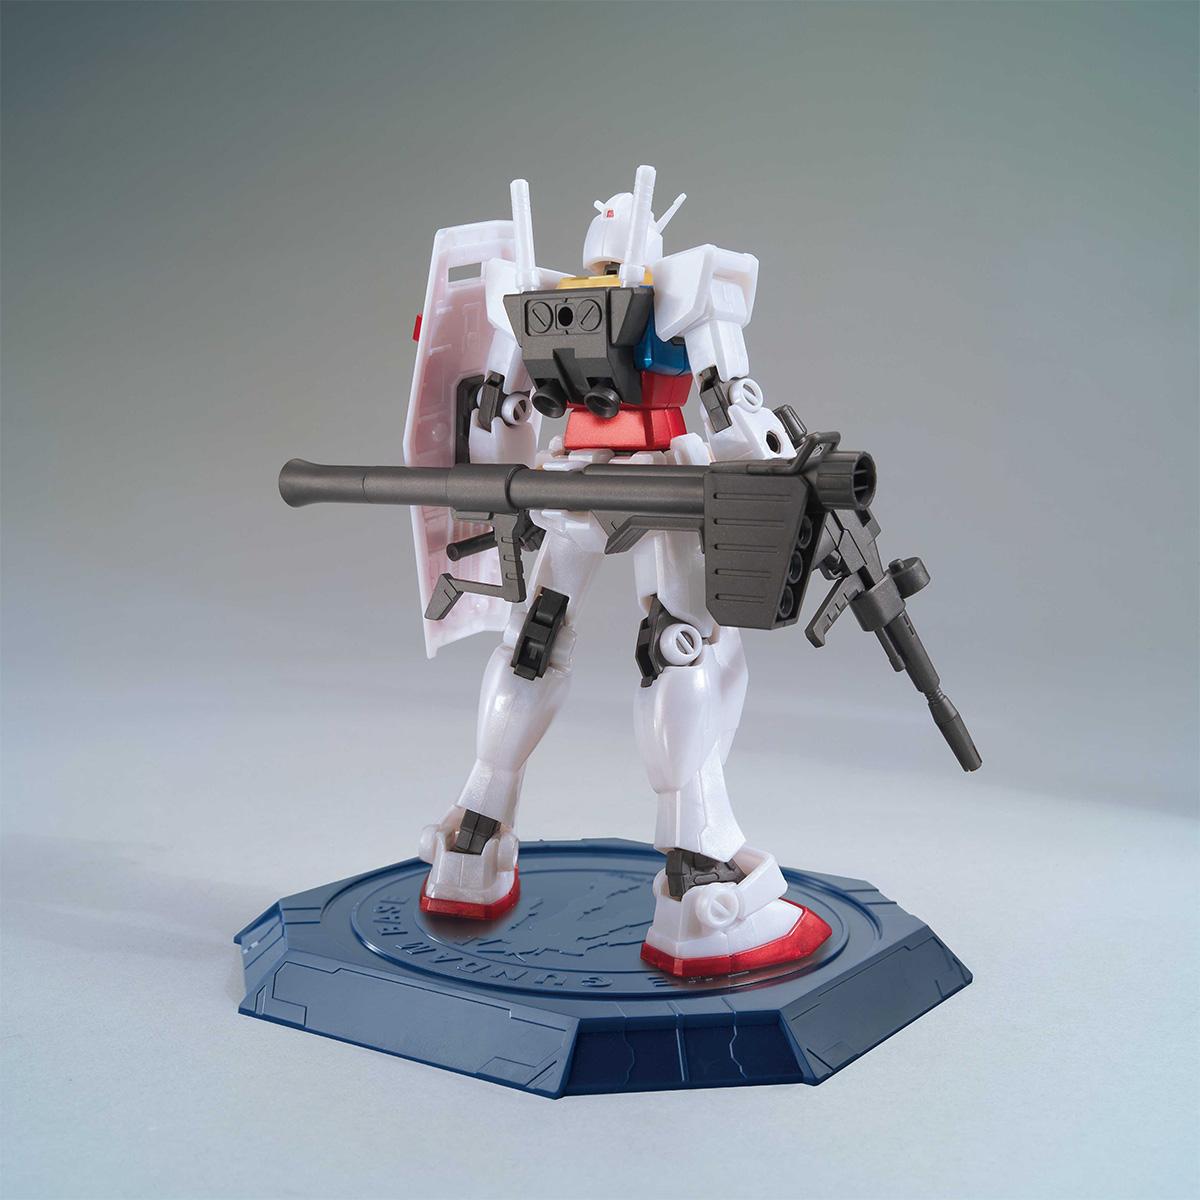 HG 1/144 THE GUNDAM BASE LIMITED RX-78-2 GUNDAM [METALLIC GLOSS INJECTION]